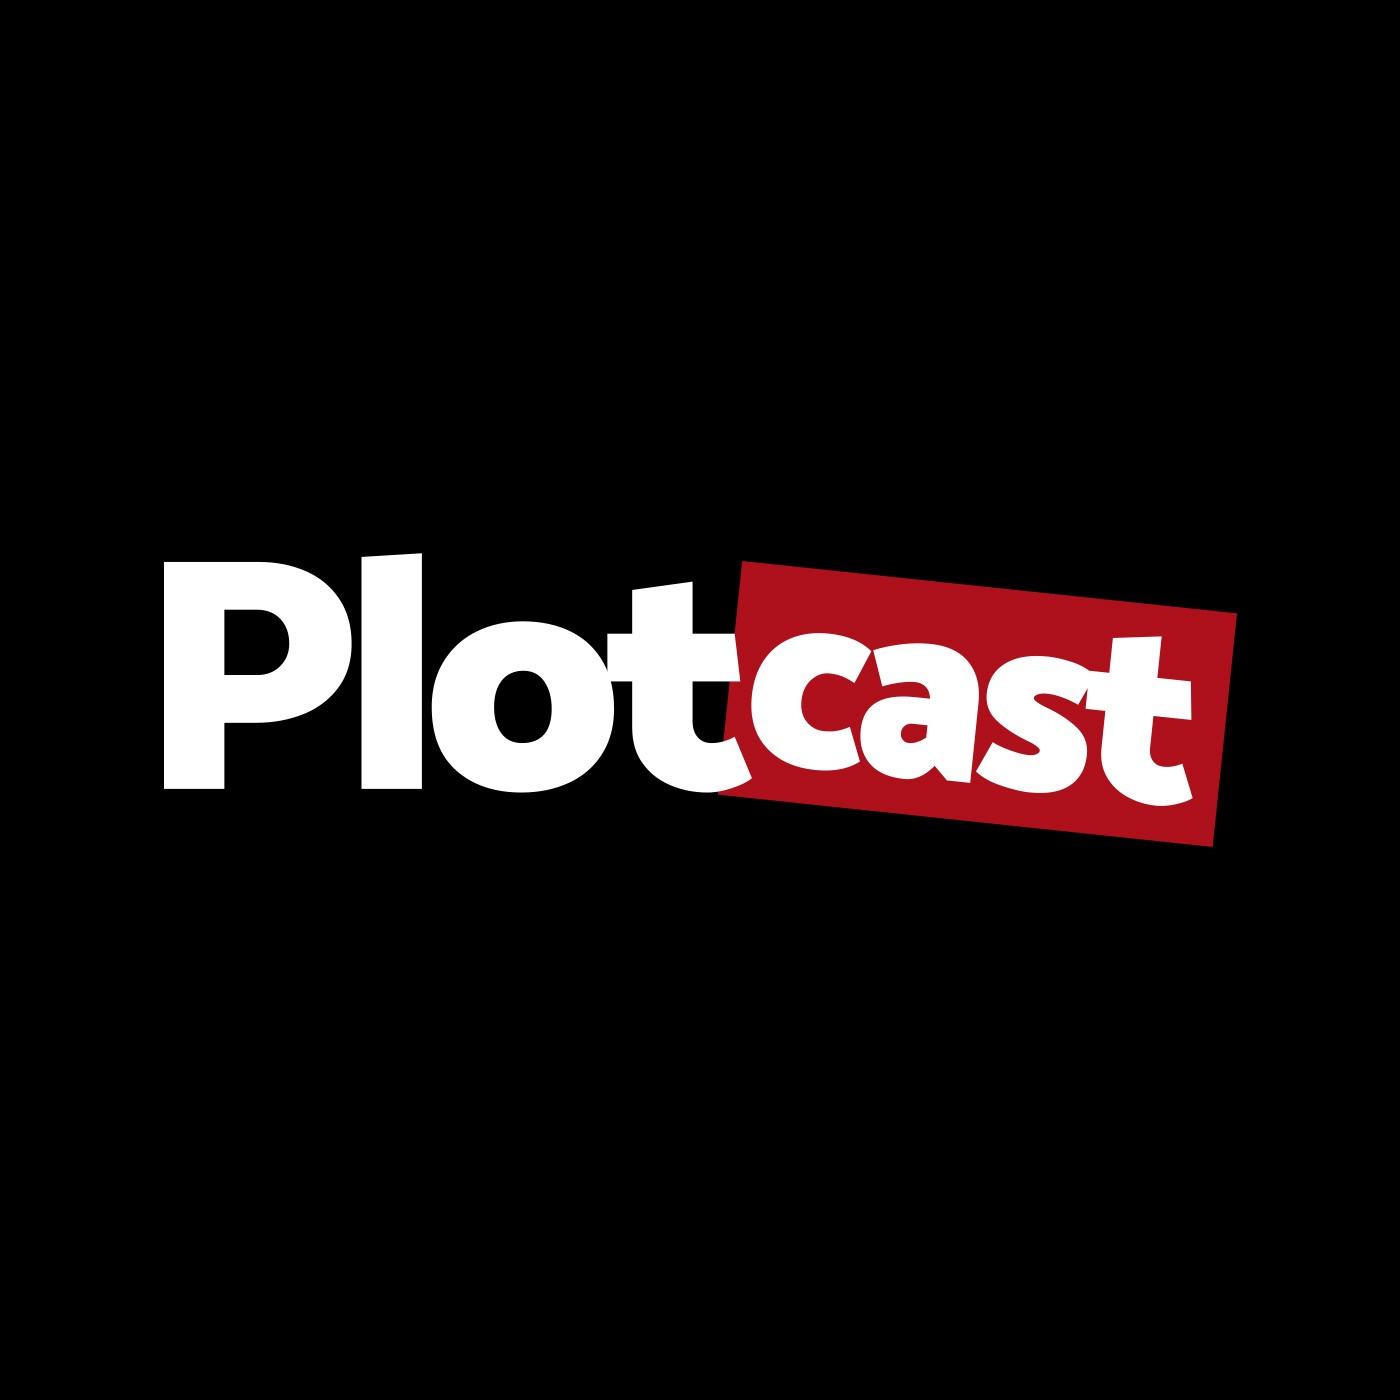 PlotCast